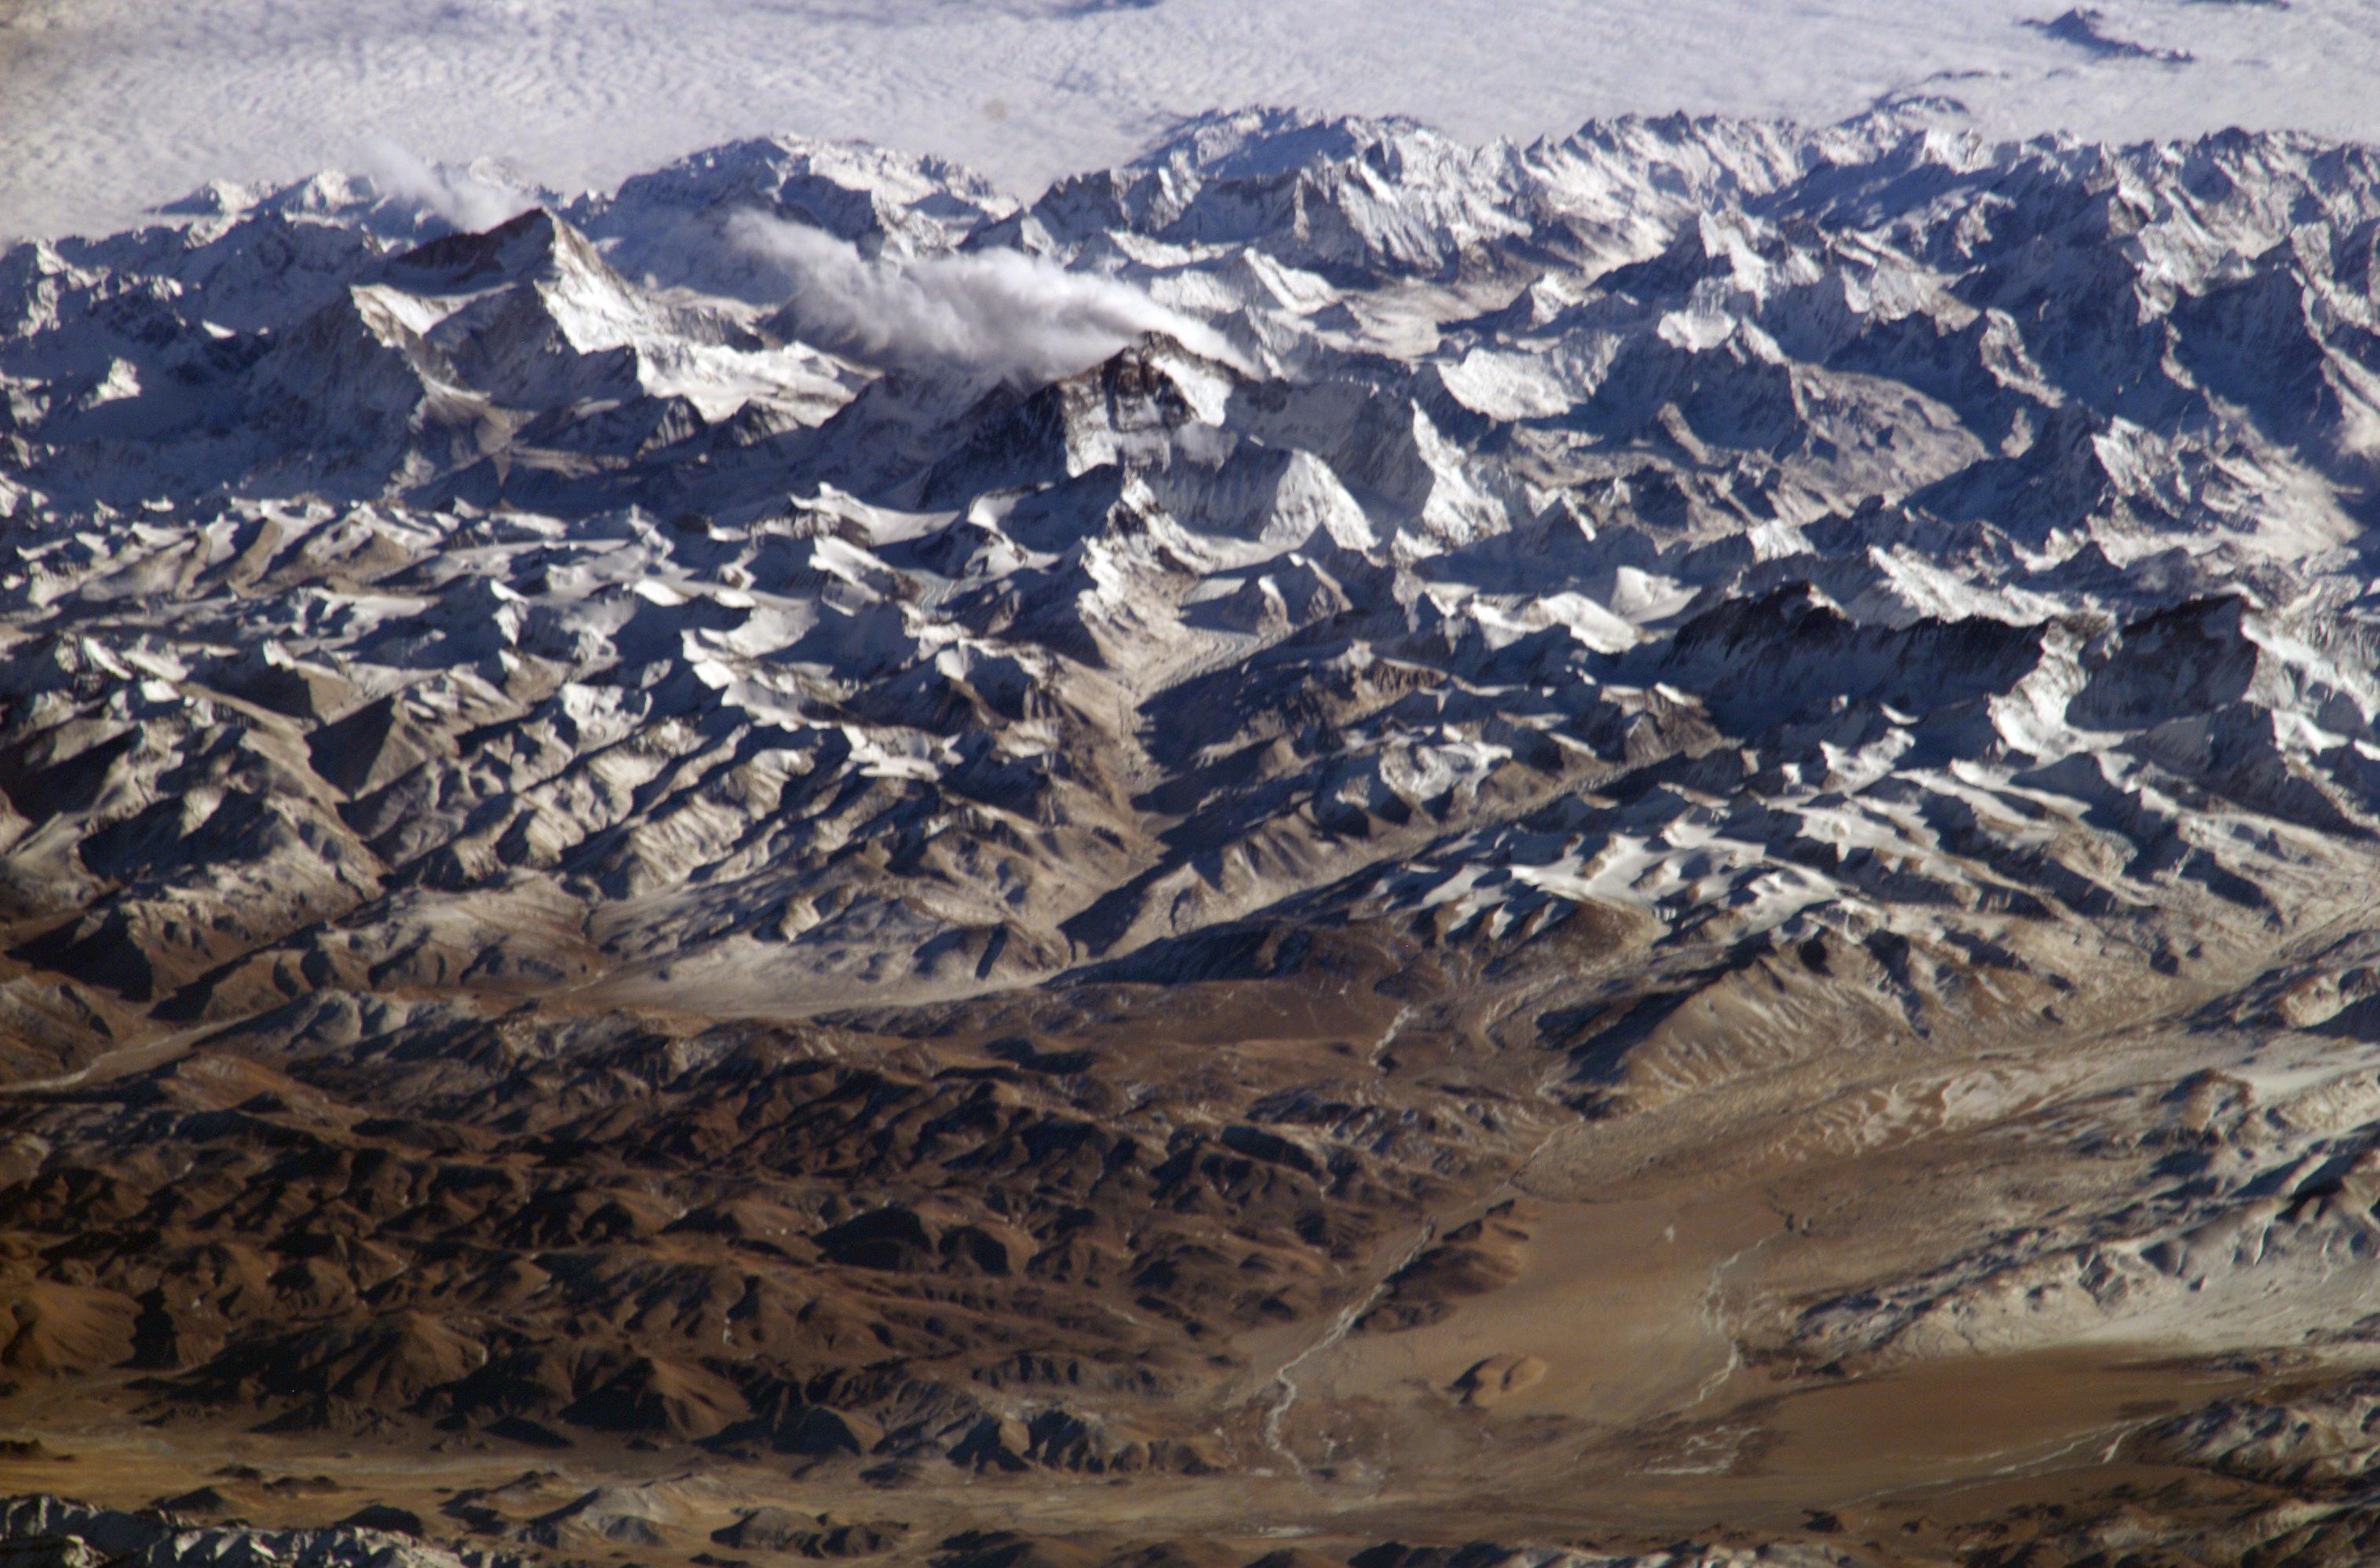 Depiction of Himalaya